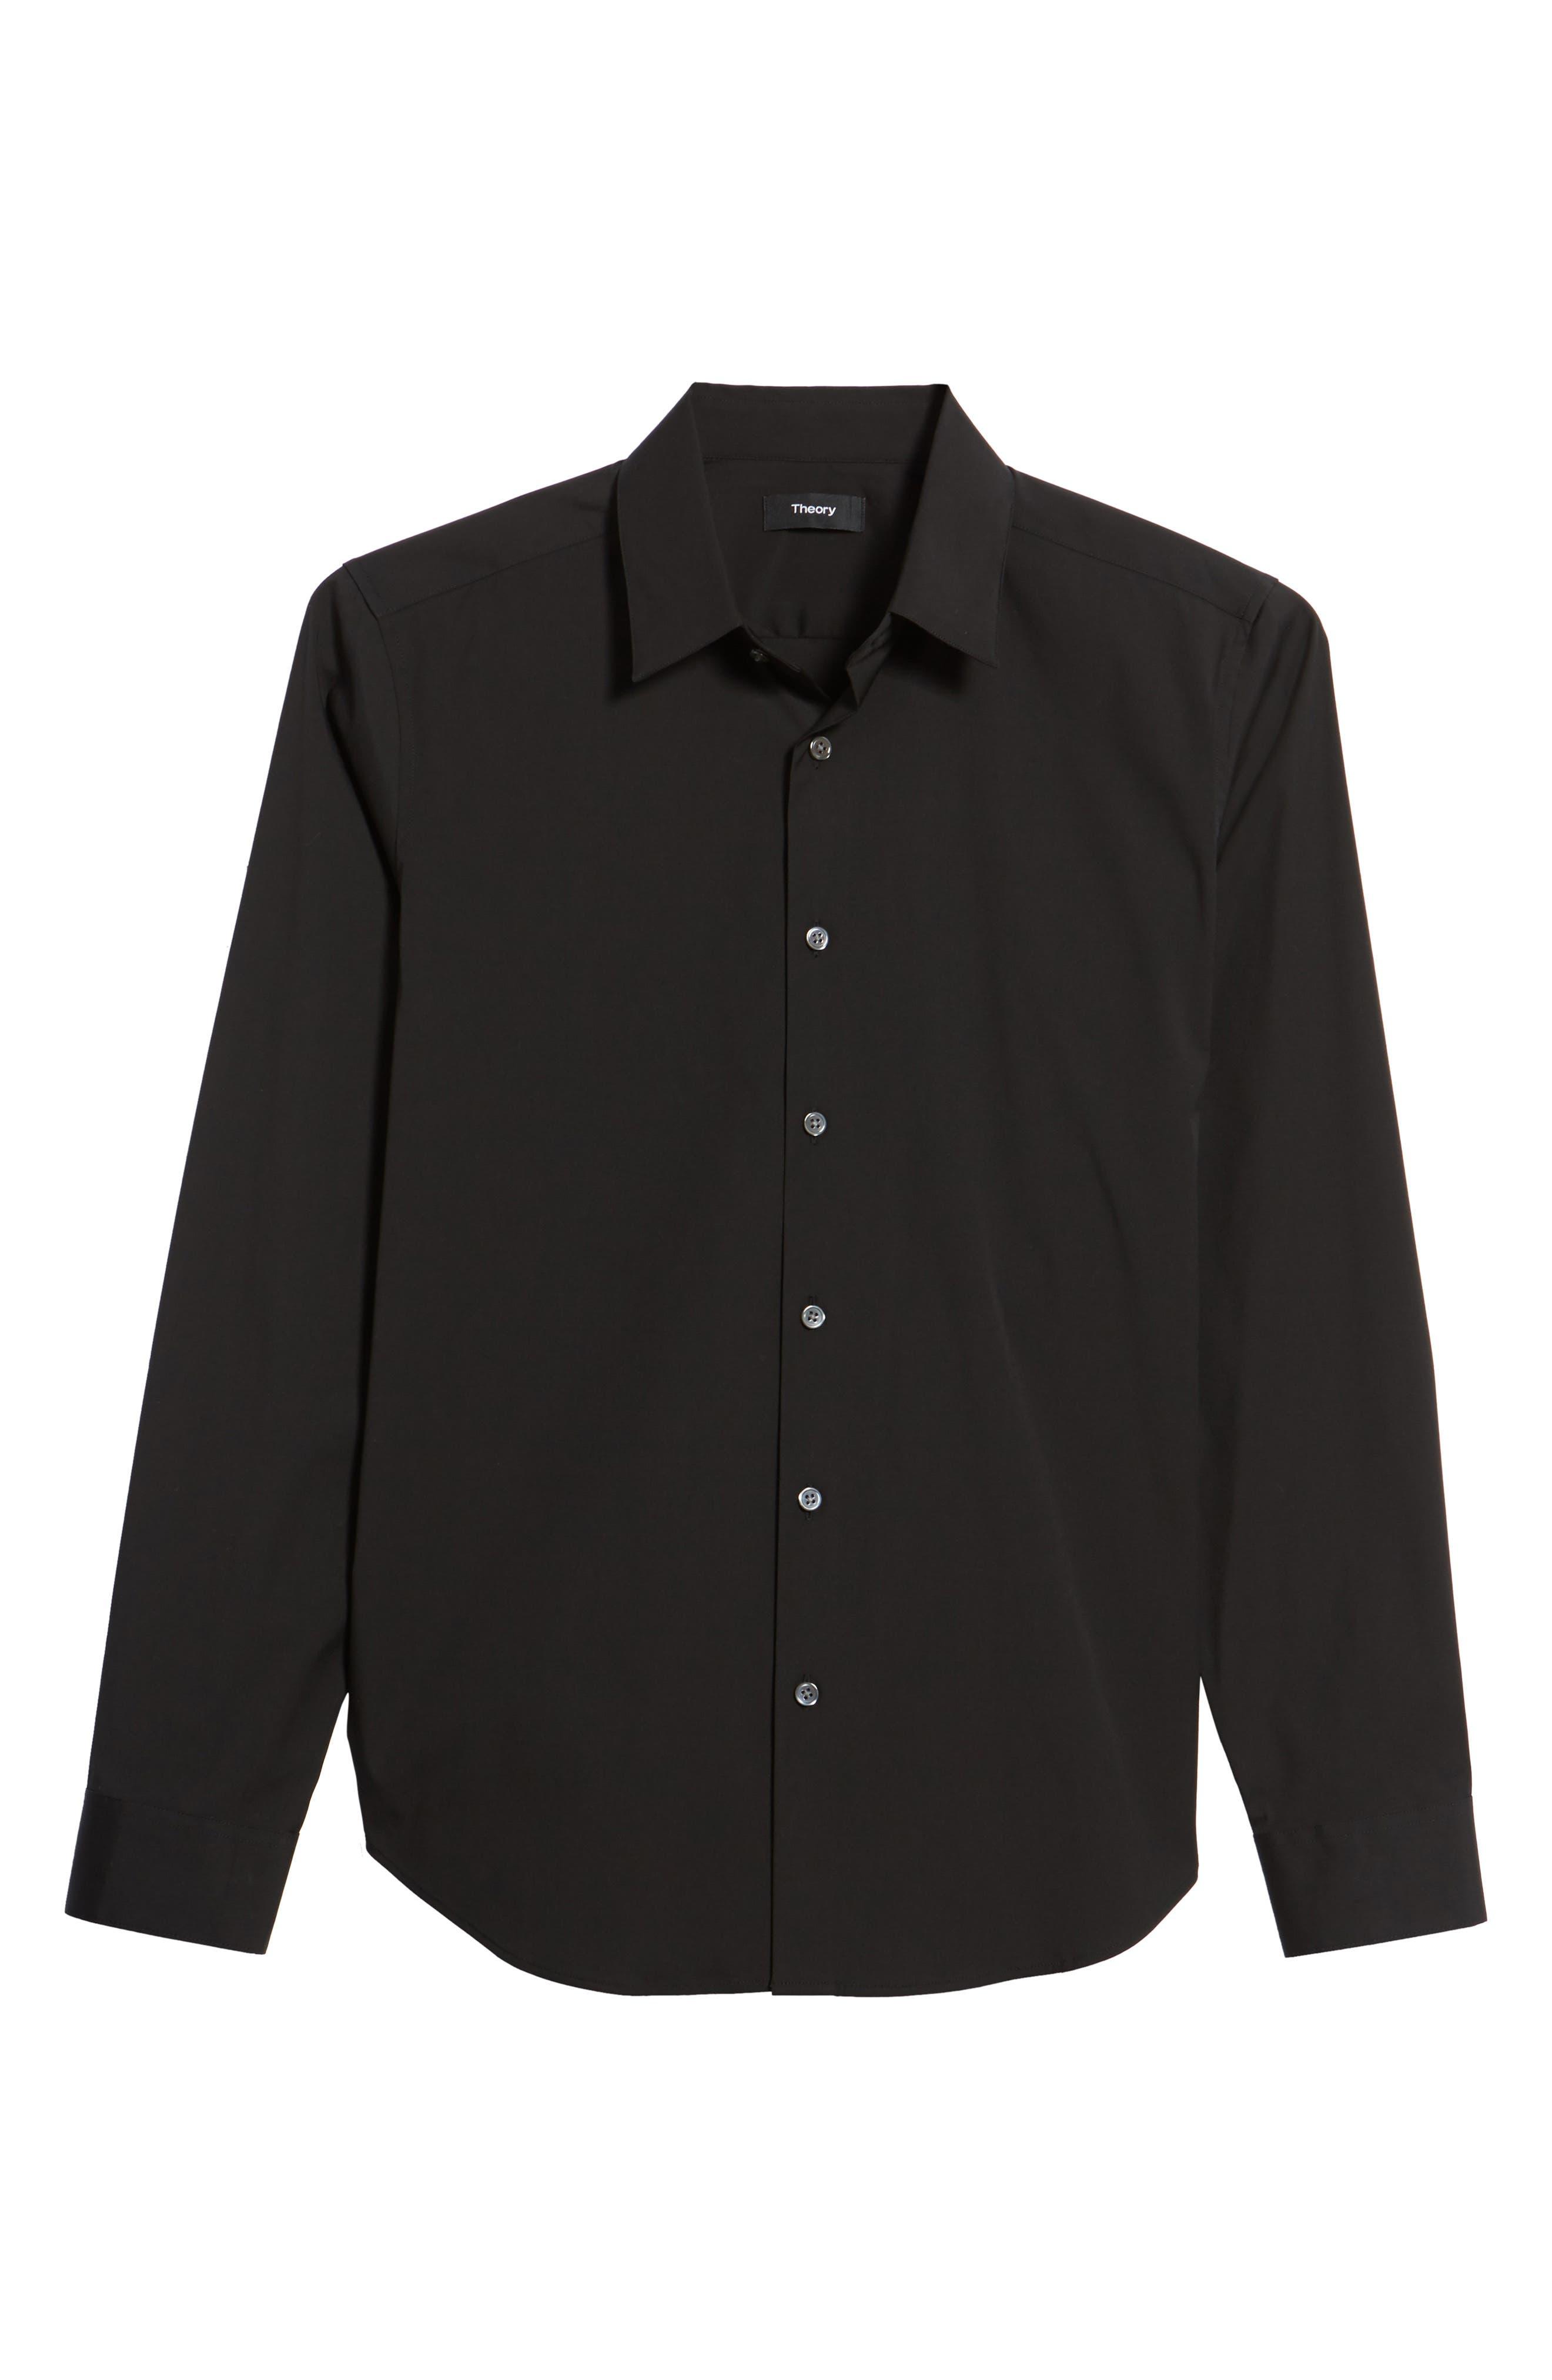 THEORY, 'Sylvain' Trim Fit Long Sleeve Sport Shirt, Main thumbnail 1, color, BLACK